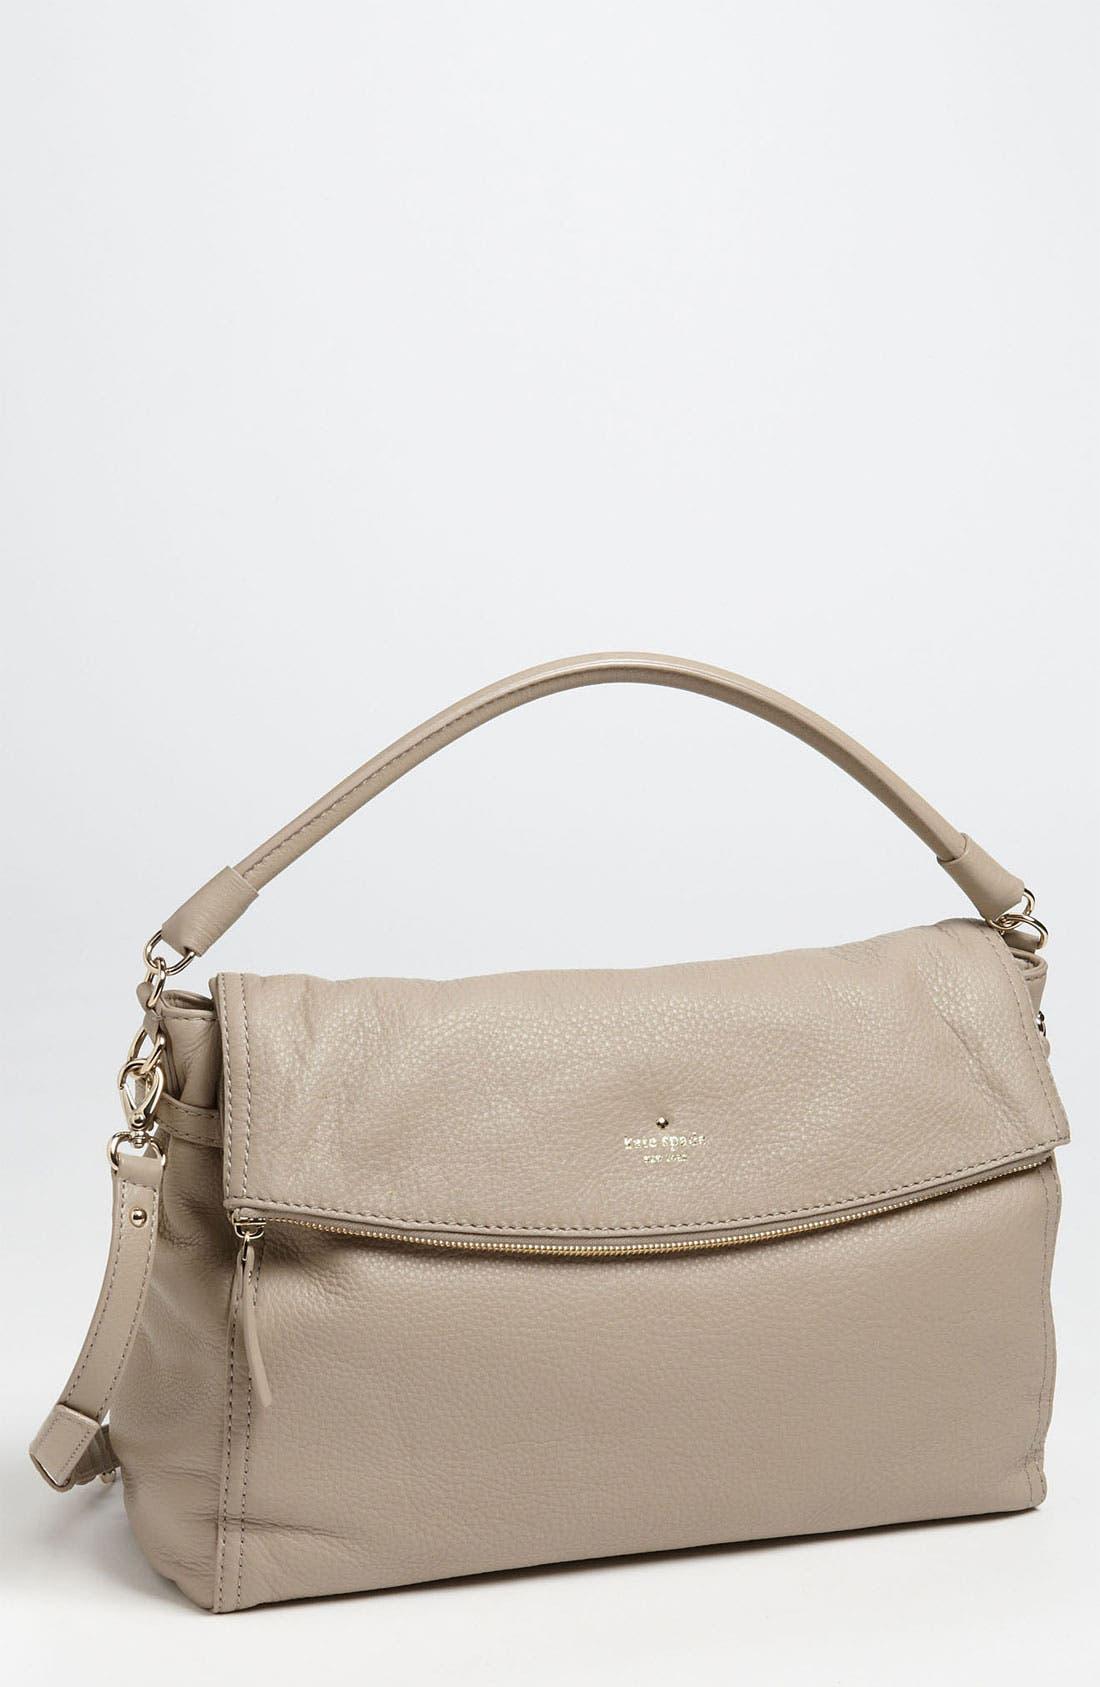 Main Image - kate spade new york 'cobble hill - minka' shoulder bag